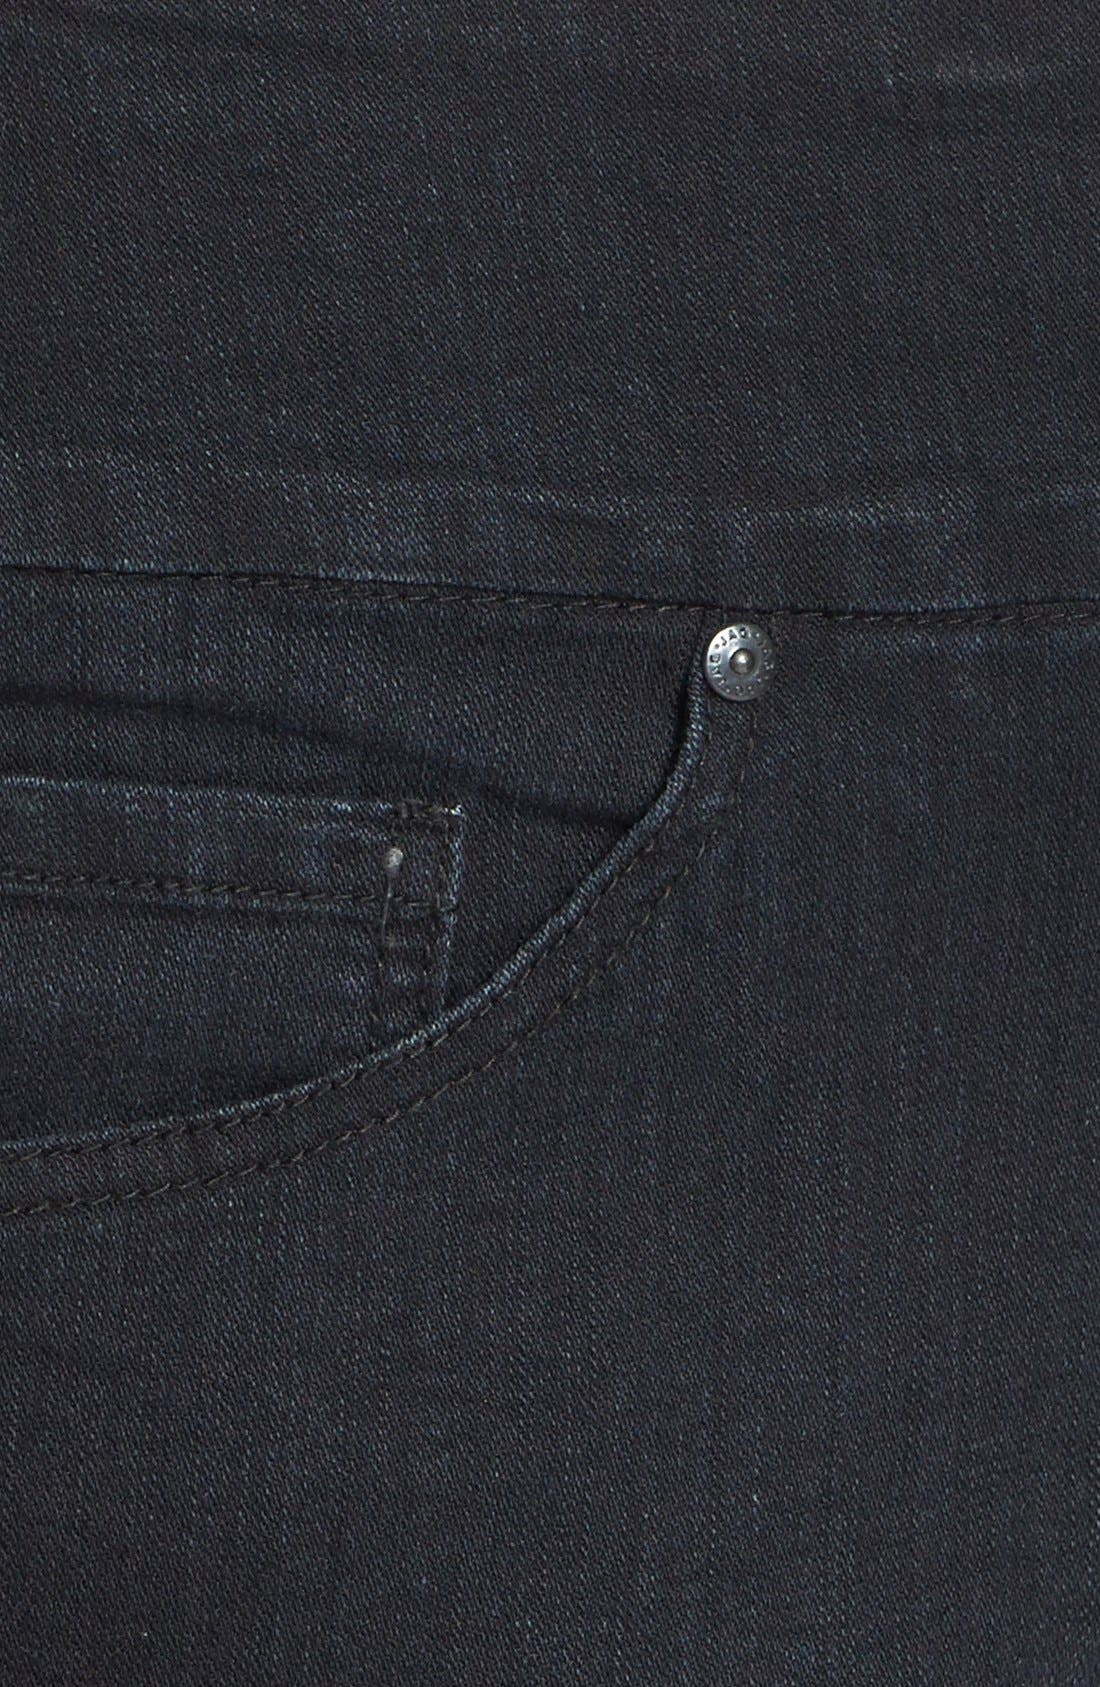 Alternate Image 3  - Jag Jeans 'Mila' Embellished Back Pocket Pull-On Straight Leg Jeans (Plus Size)